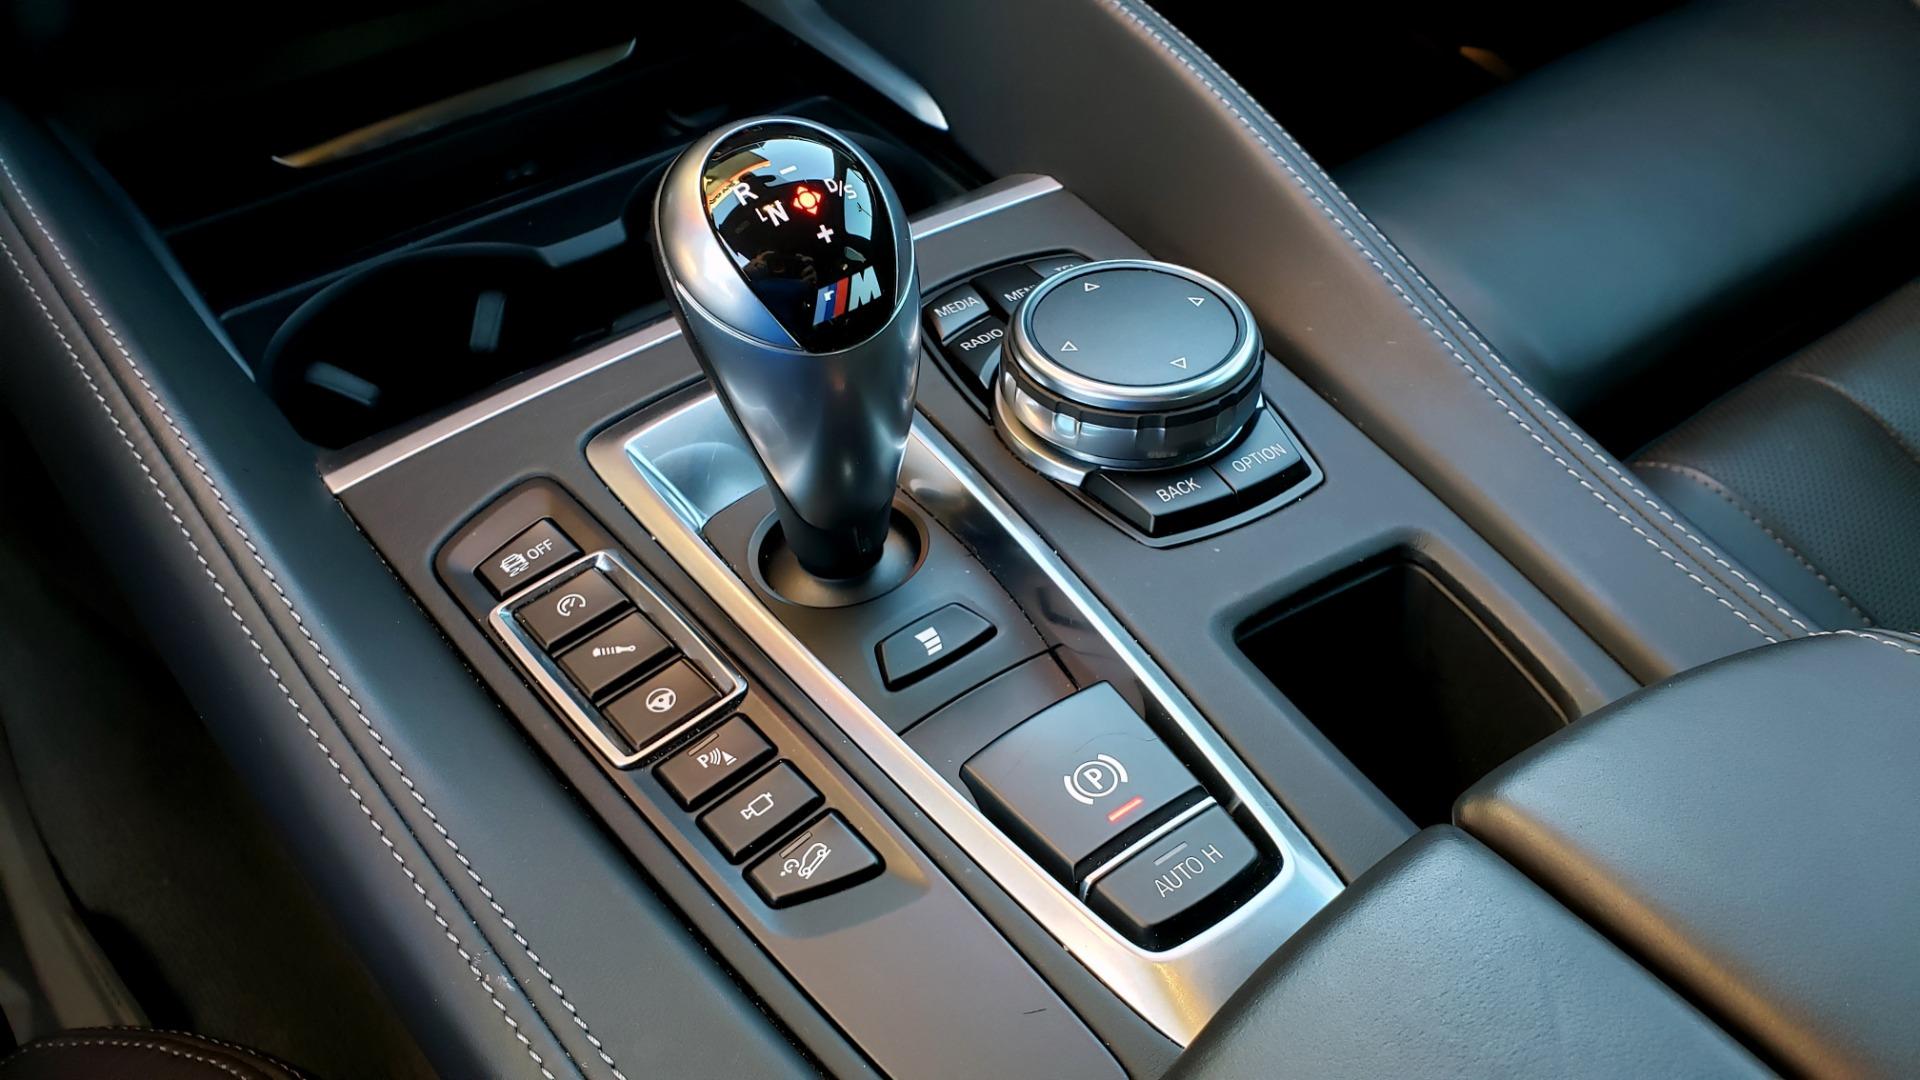 Used 2016 BMW X6 M EXEC PKG / DRVR ASST / NAV / SUNROOF / BLIND SPOT / REARVIEW for sale Sold at Formula Imports in Charlotte NC 28227 52